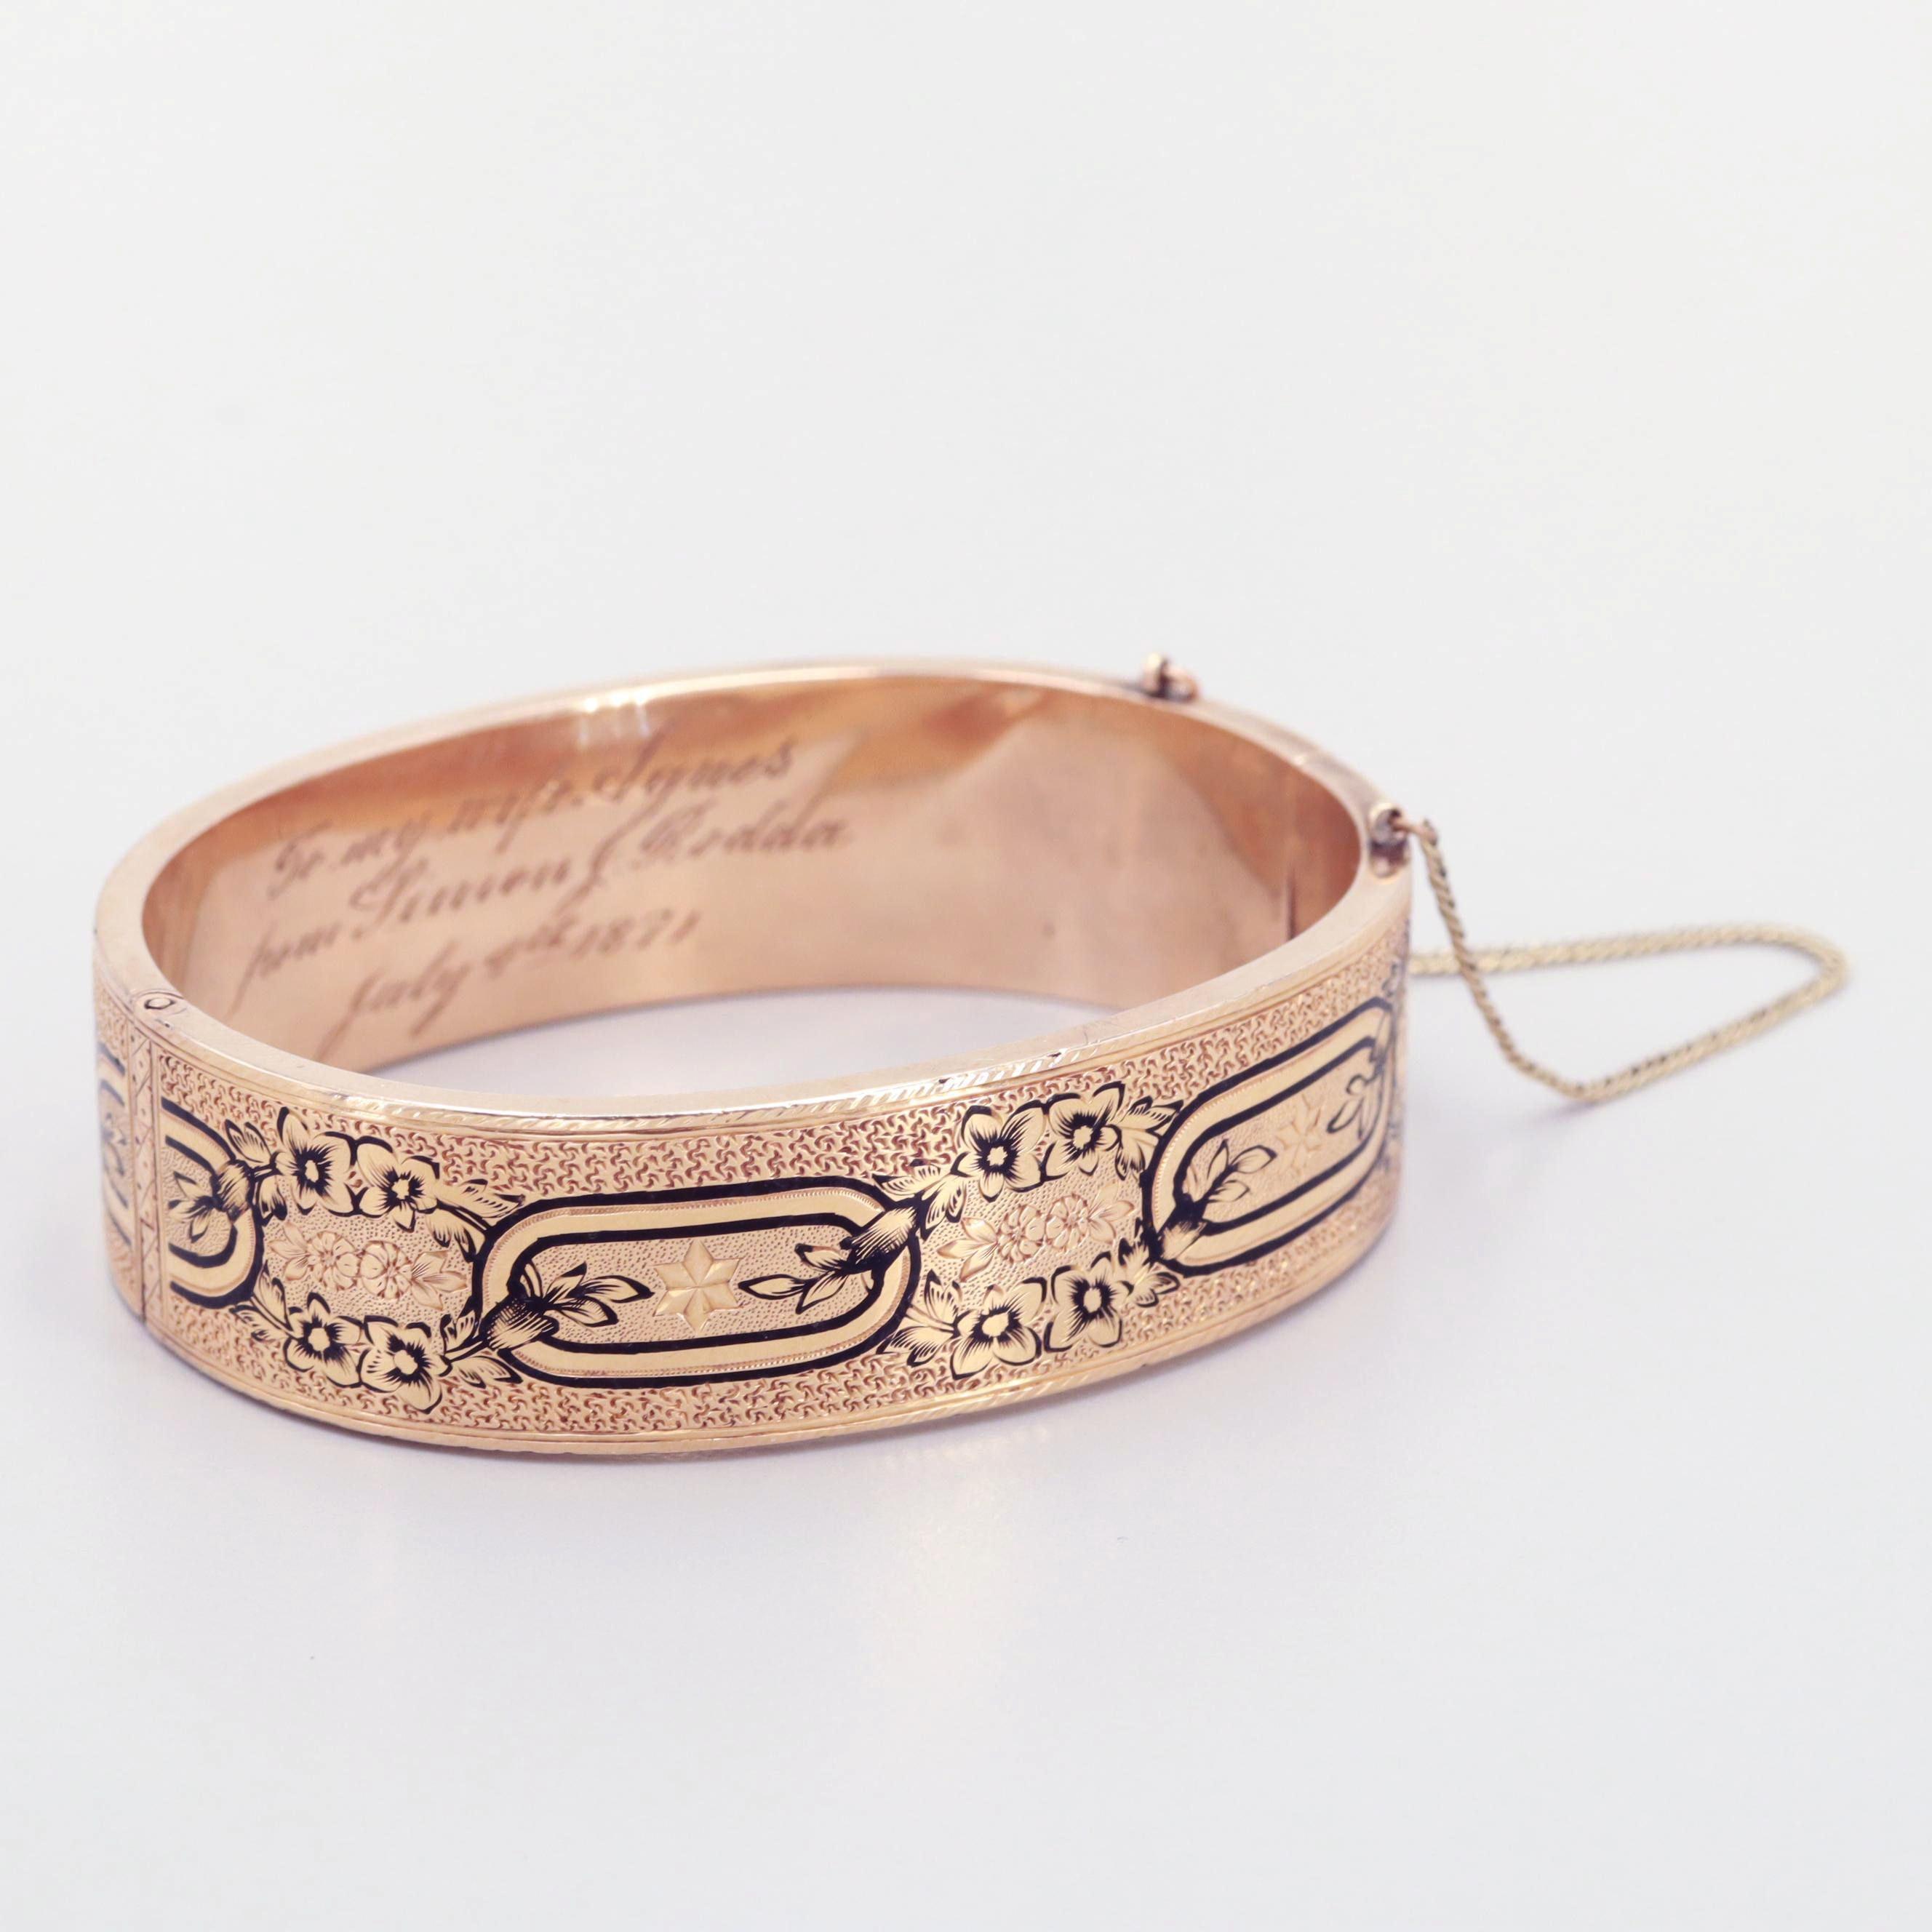 Taille d'Epargne Victorian Gold Tone Enamel Hinged Bracelet